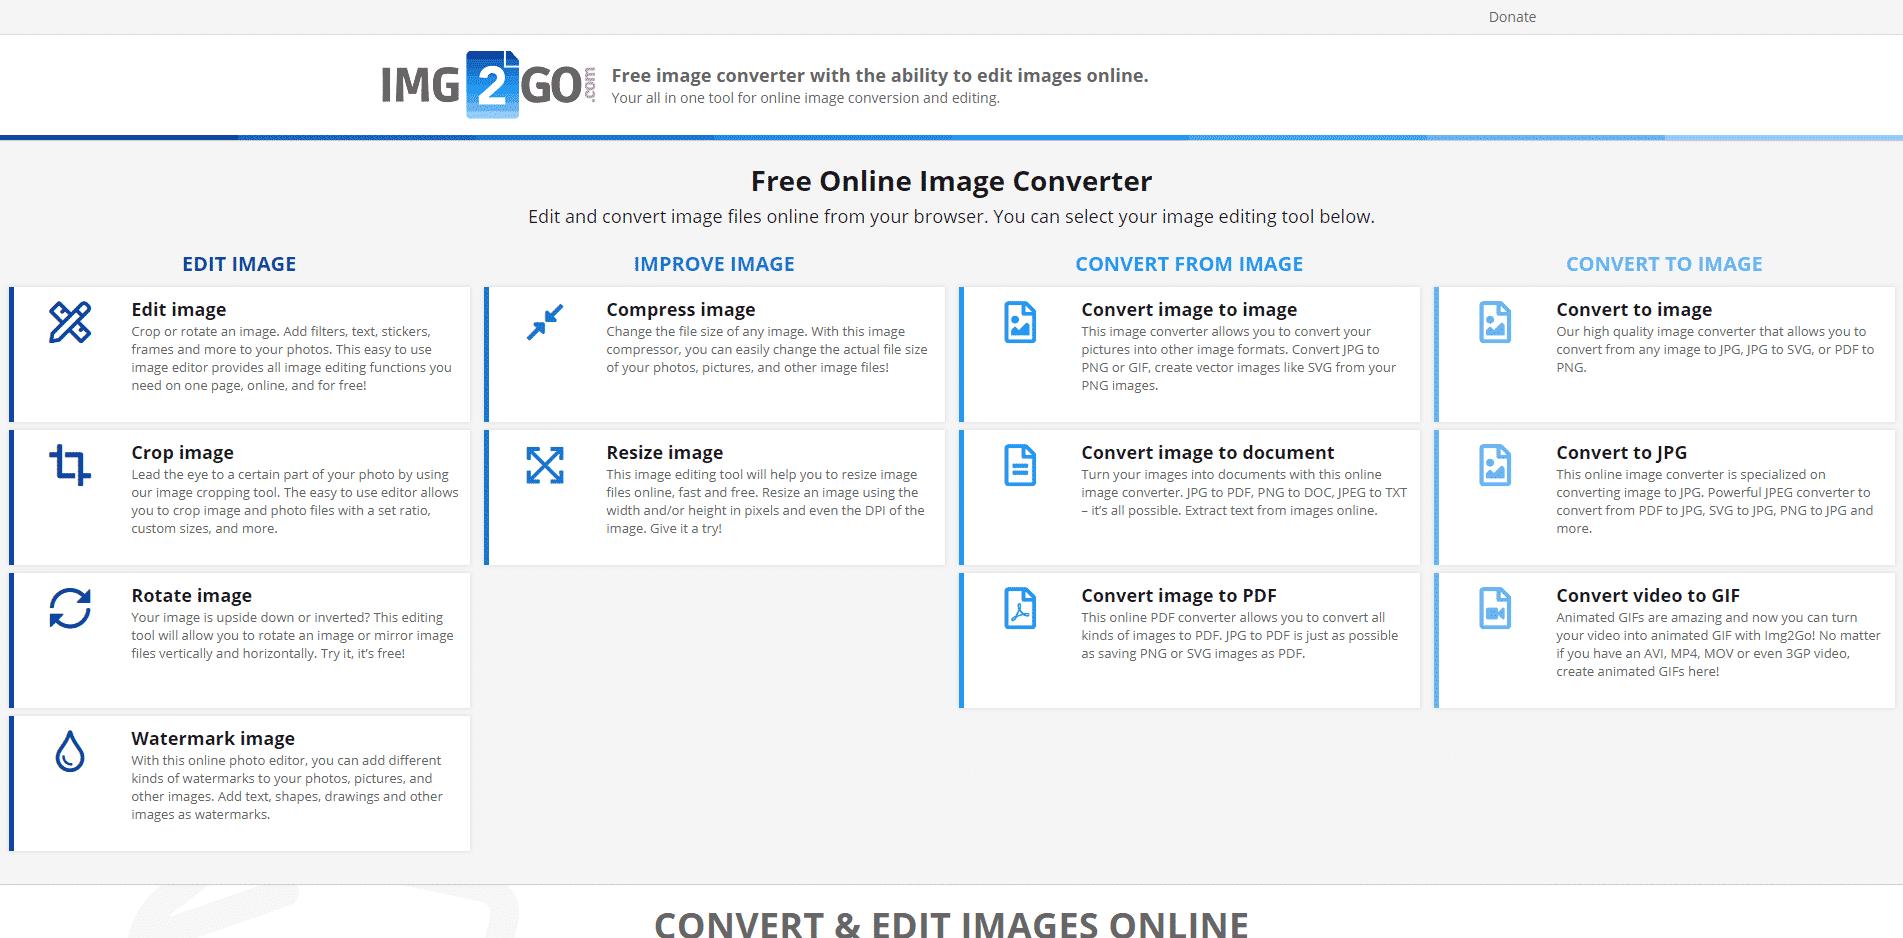 Jalankan-aplikasi-web-browser-di-perangkat-Anda-kemudian-ketikkan-alamat